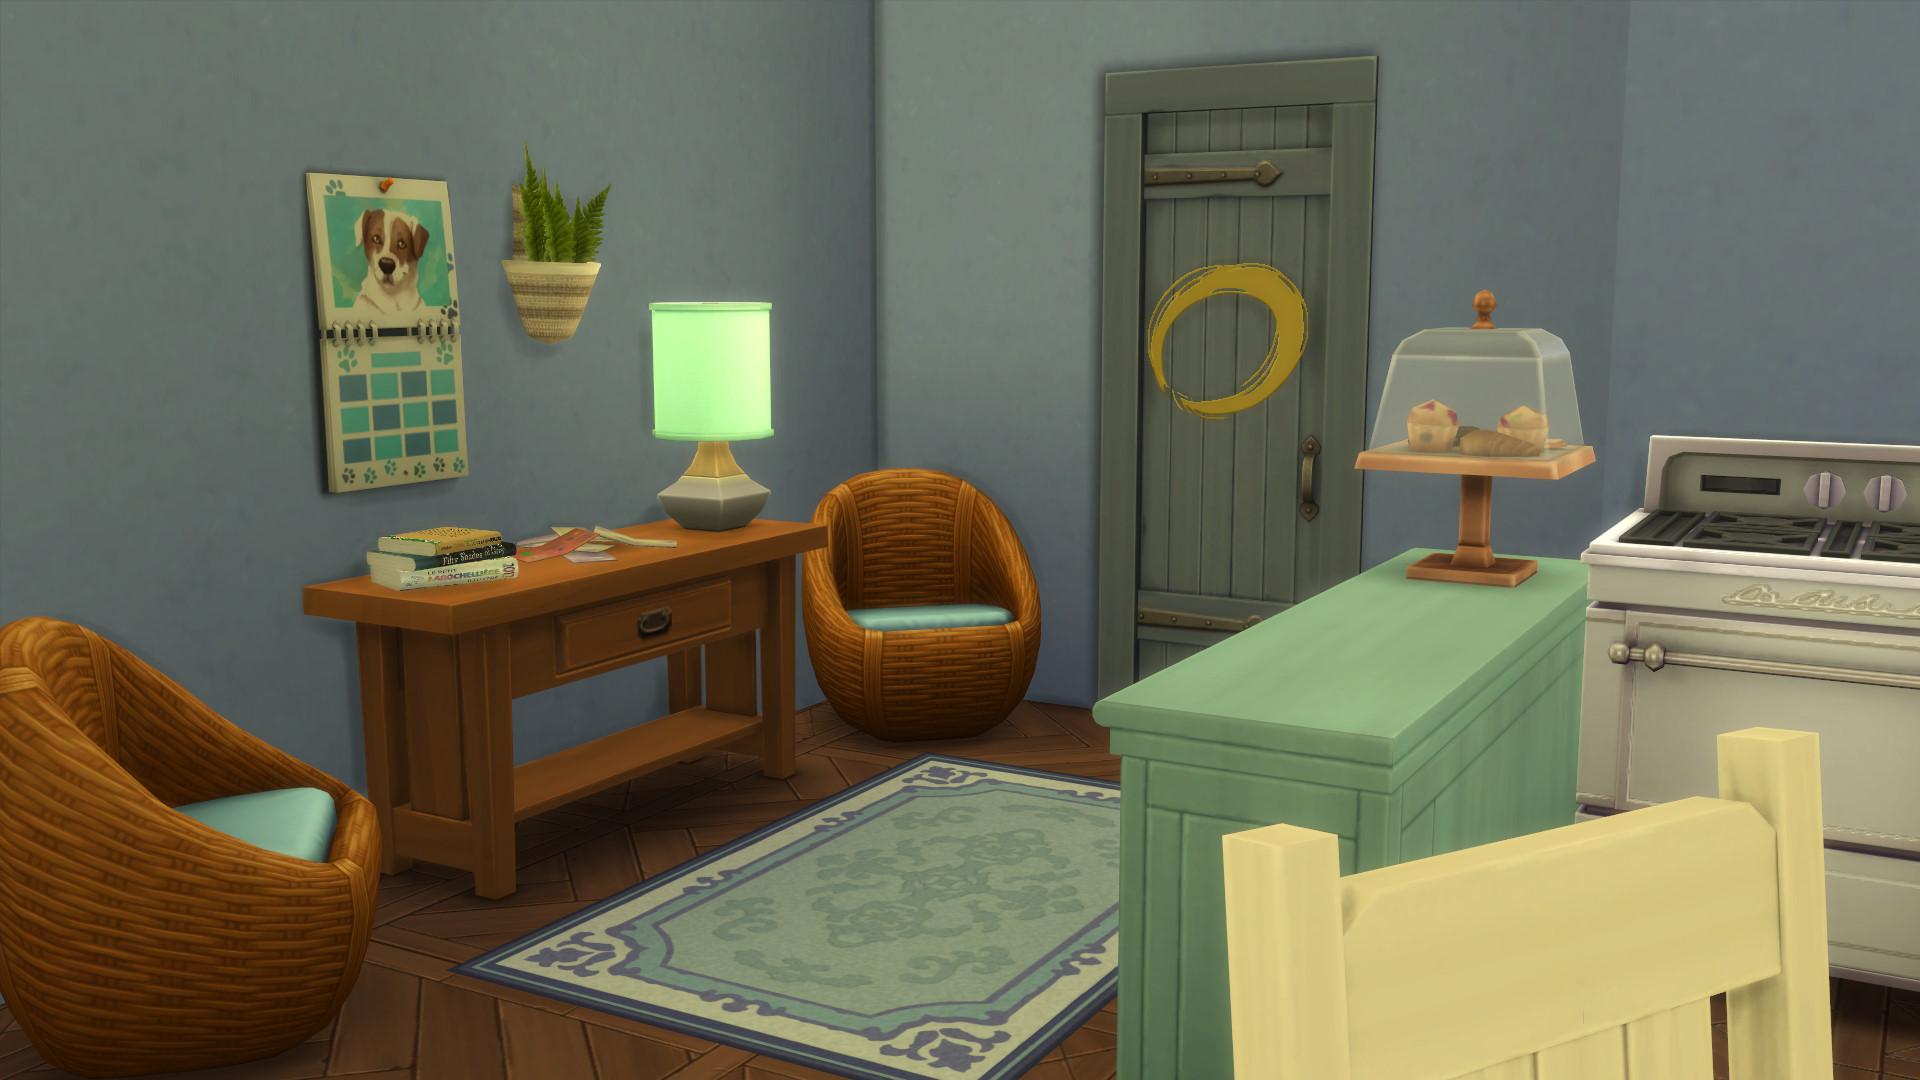 Friends Apartment Sims 8